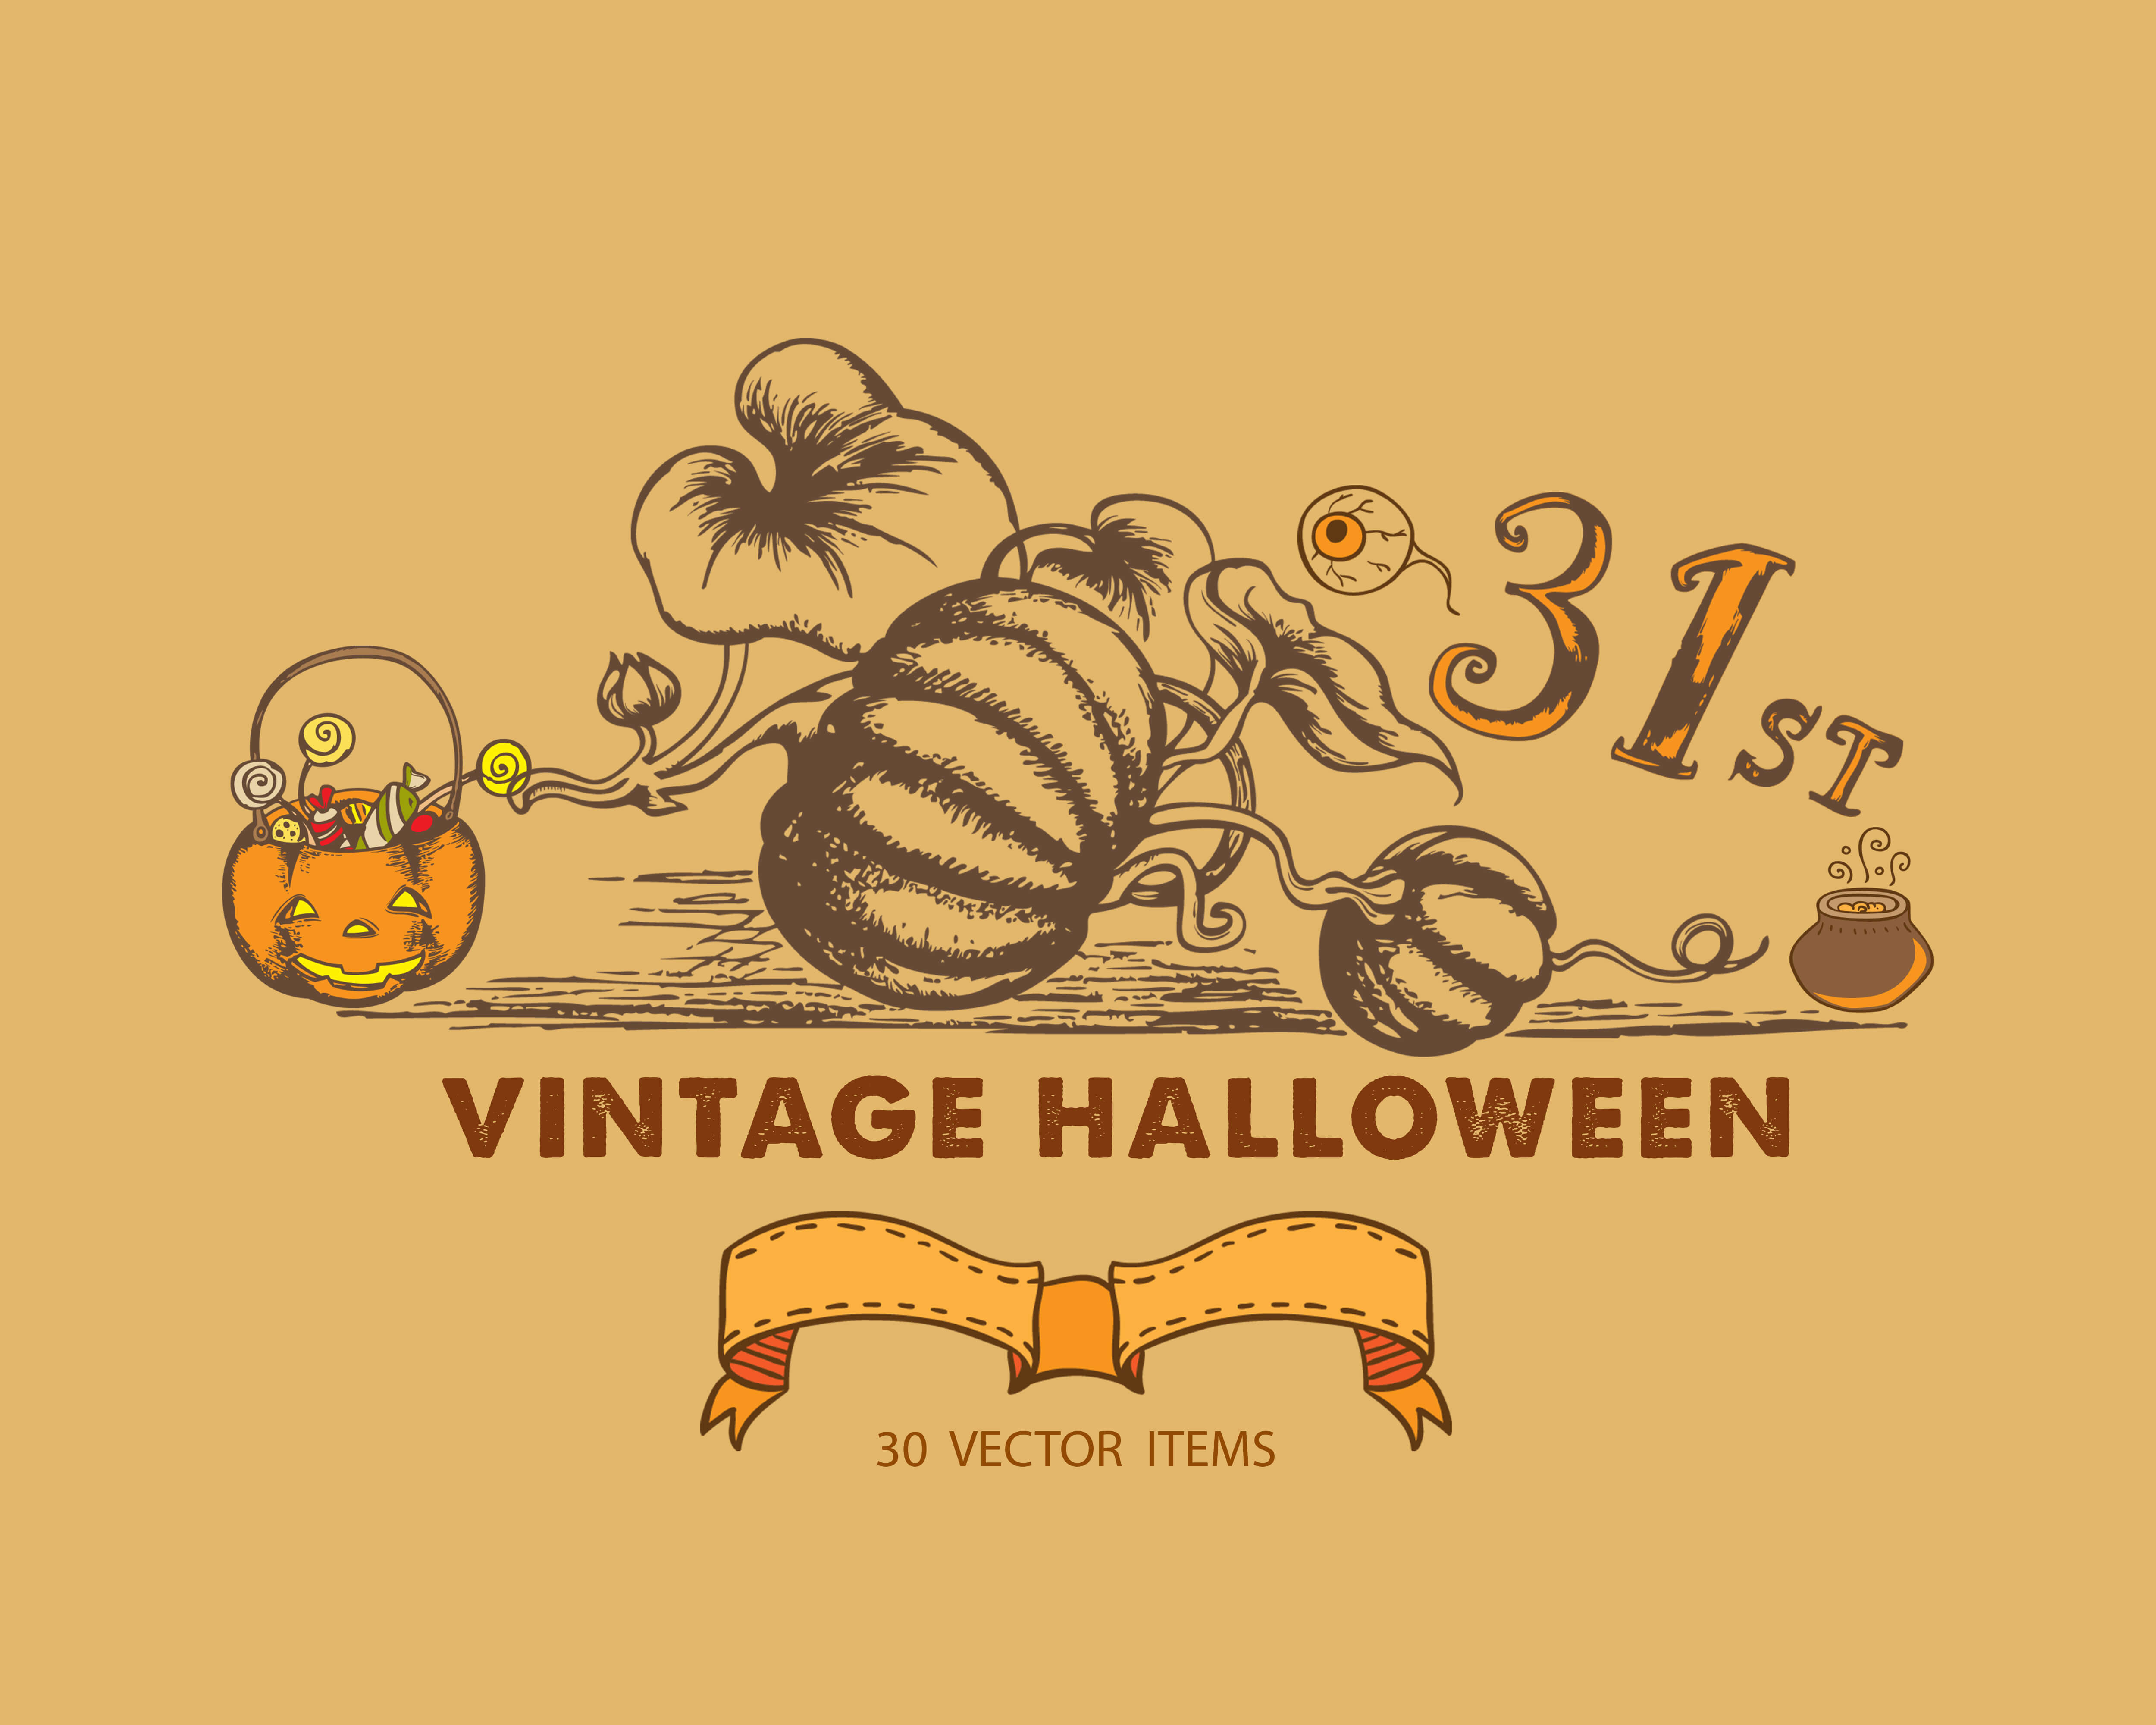 Spooky Vector Images - 30 Vintage Halloween